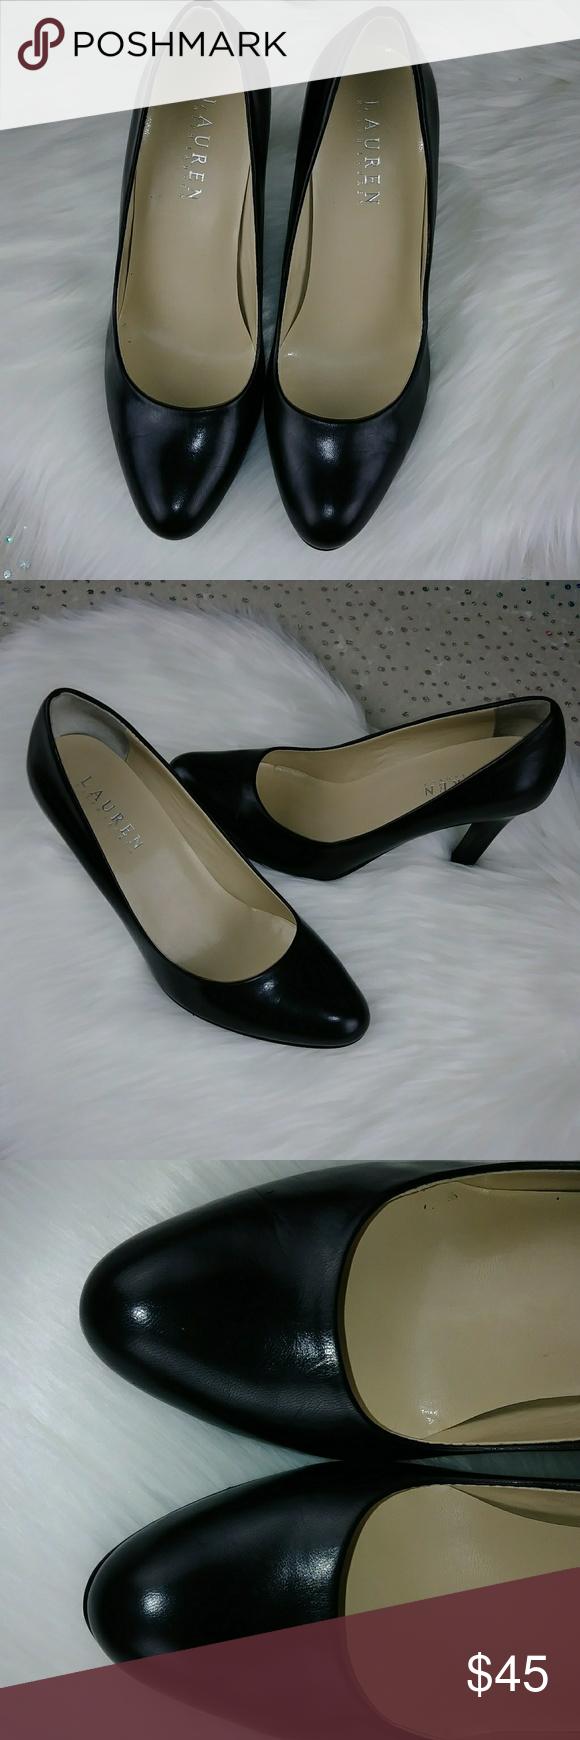 5530dbae62 Lauren RL Soft Black Leather